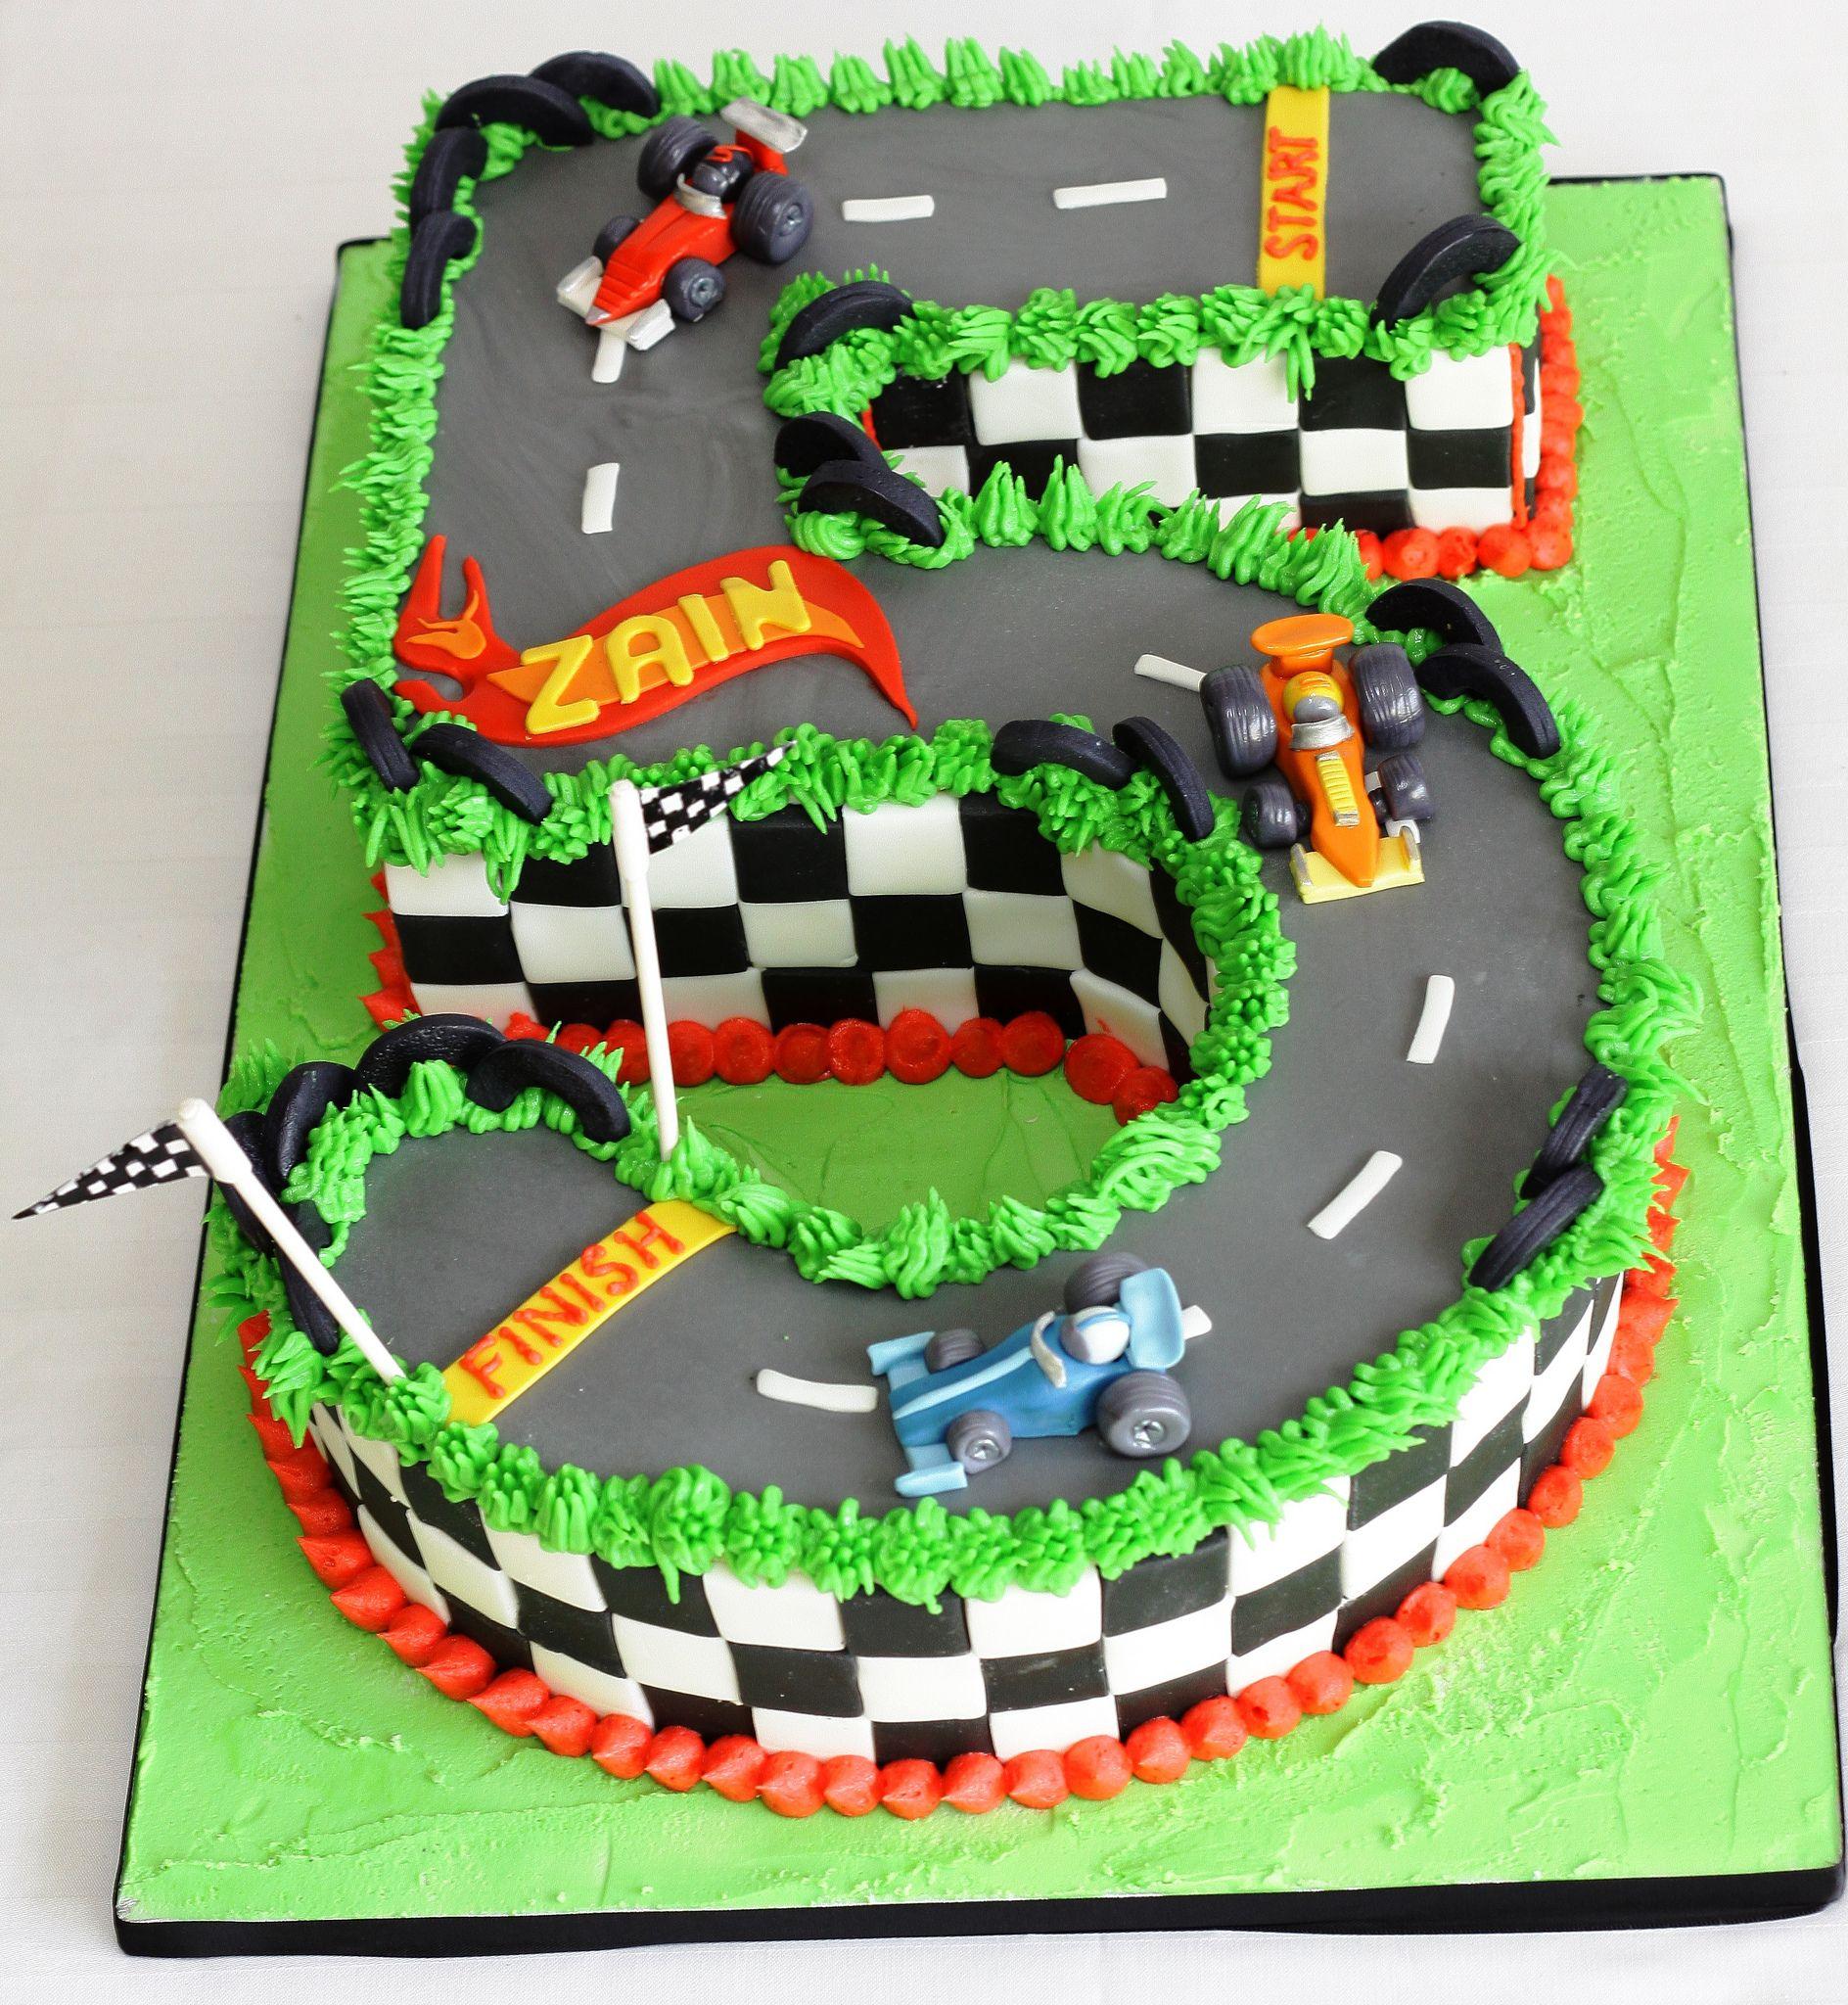 Astonishing Hotwheels Styled Race Car 5Th Birthday Cake Con Immagini Torte Funny Birthday Cards Online Alyptdamsfinfo